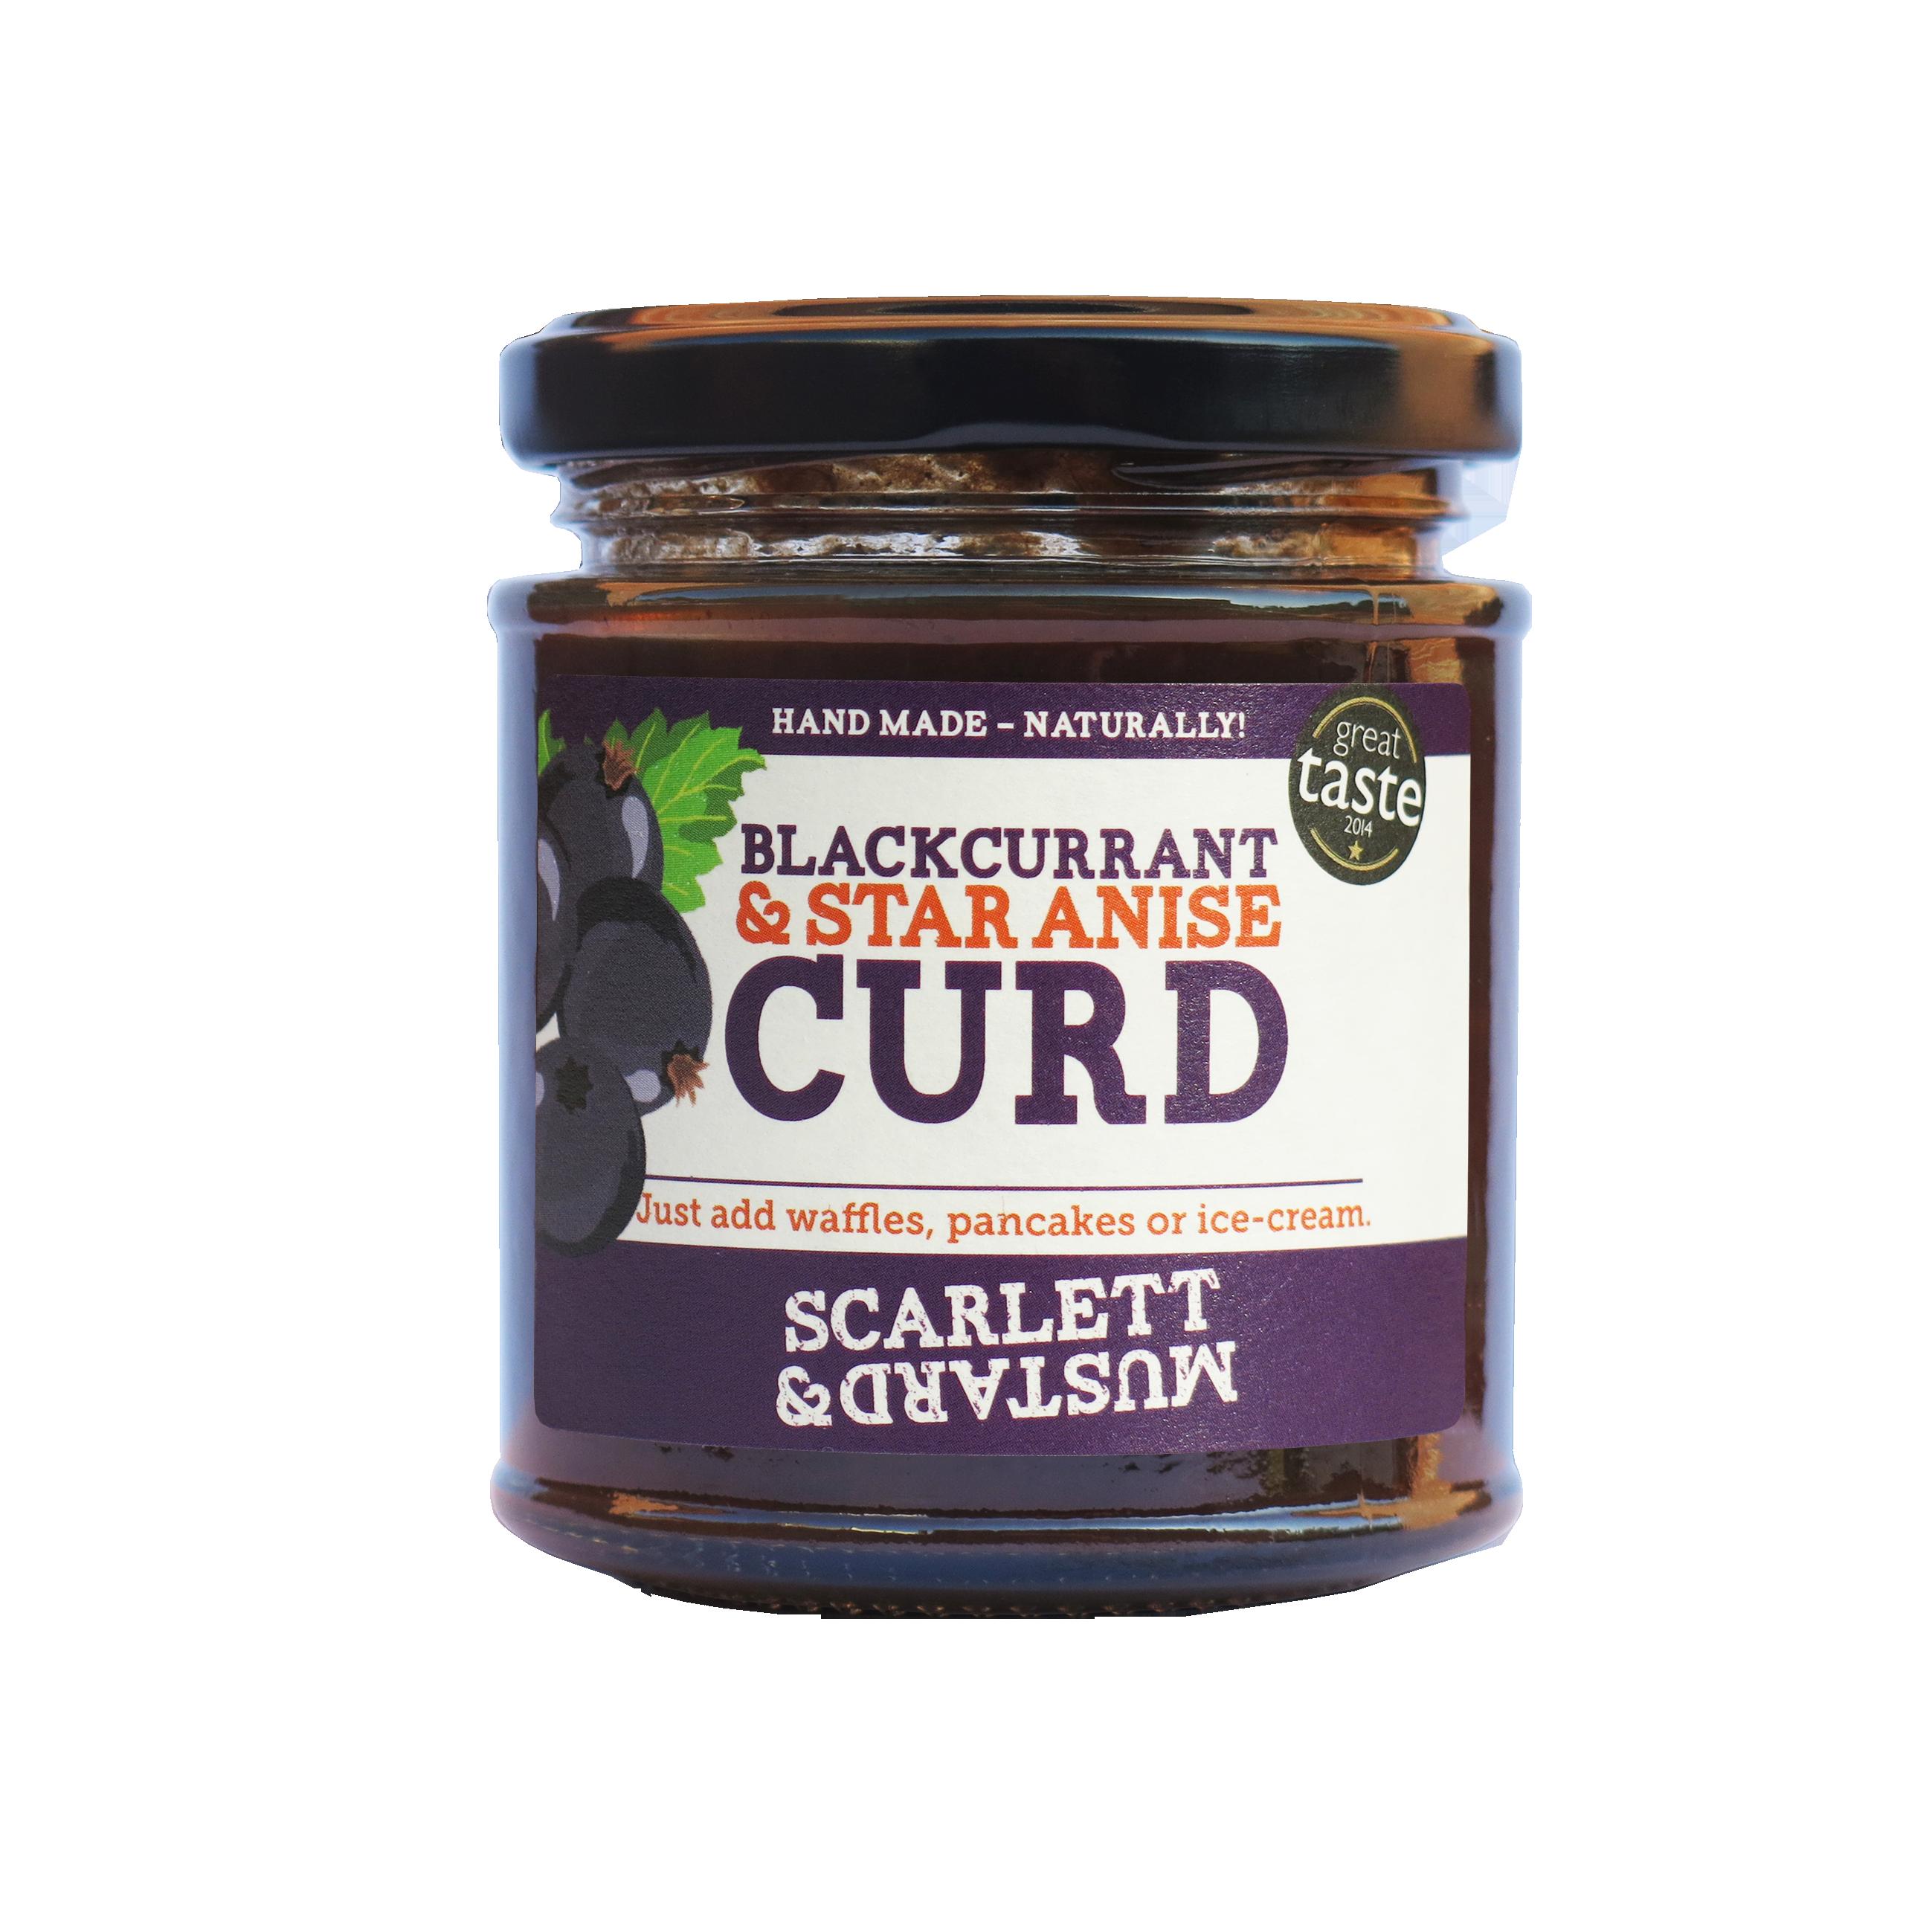 Scarlett & Mustard Blackcurrant & Star Anise Curd